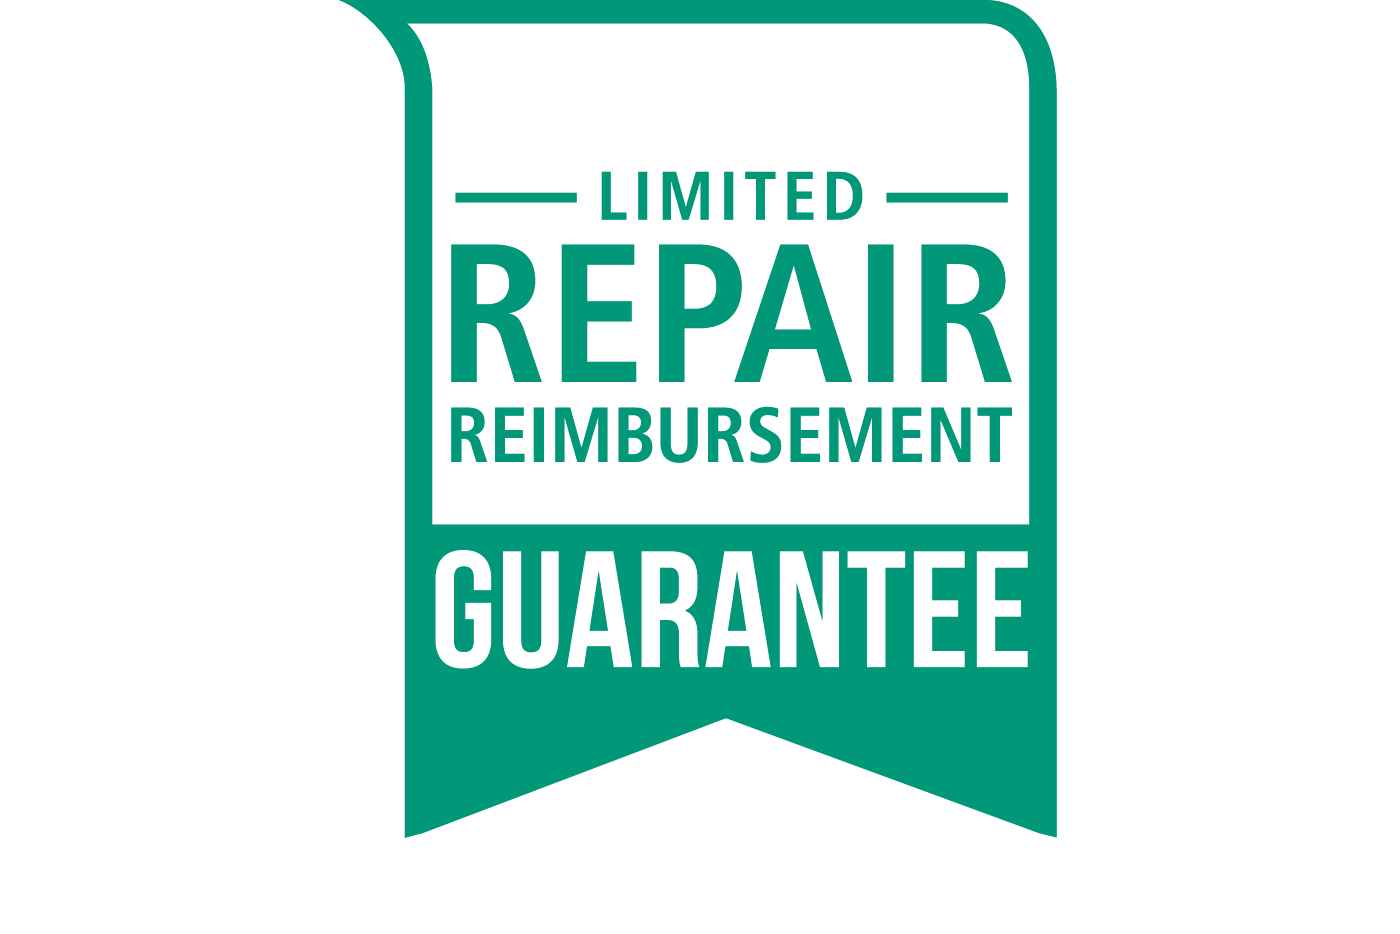 Exclusive Written Limited Repair Reimbursement Guarantee